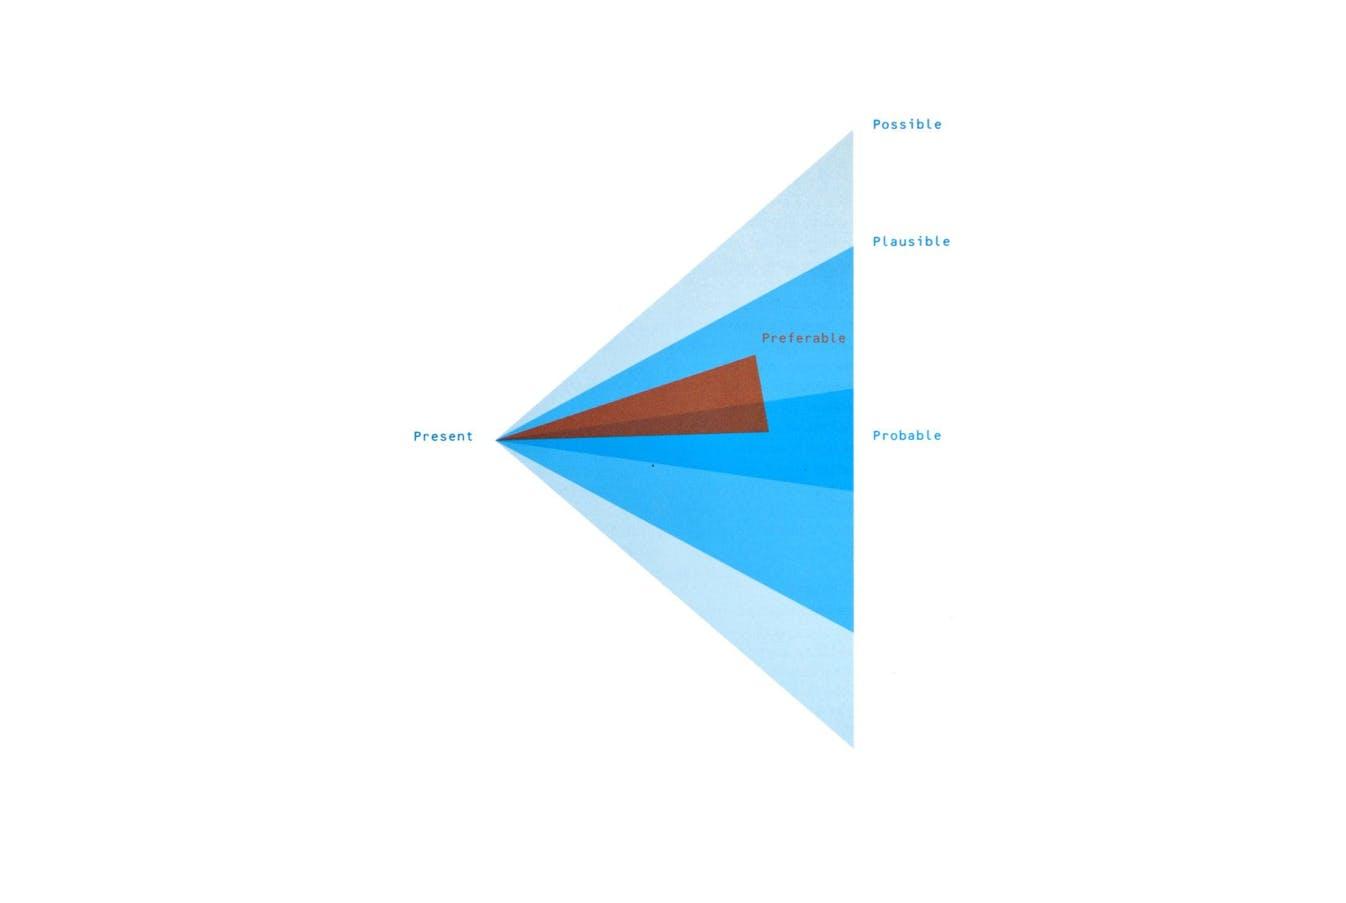 Speculate eveverything - Illustration